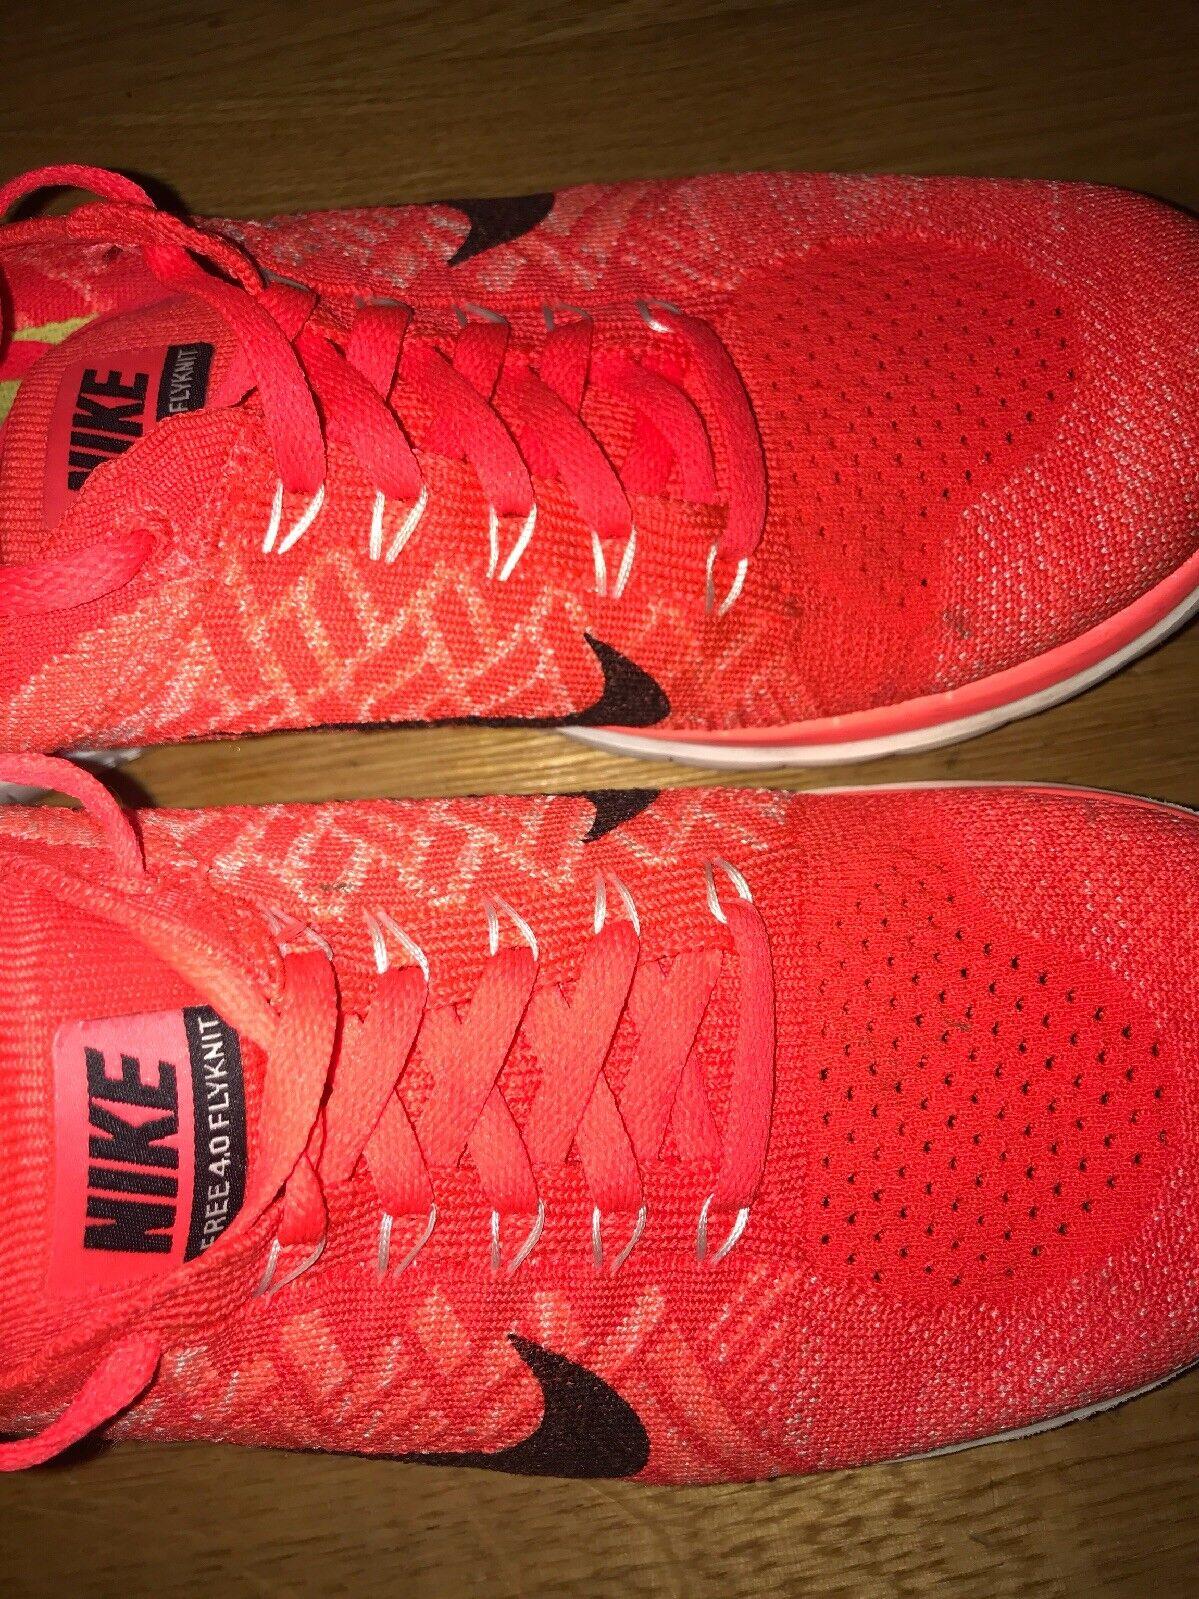 Nike Flyknit 4.0 | Bella E Affascinante  | Uomo/Donna Scarpa